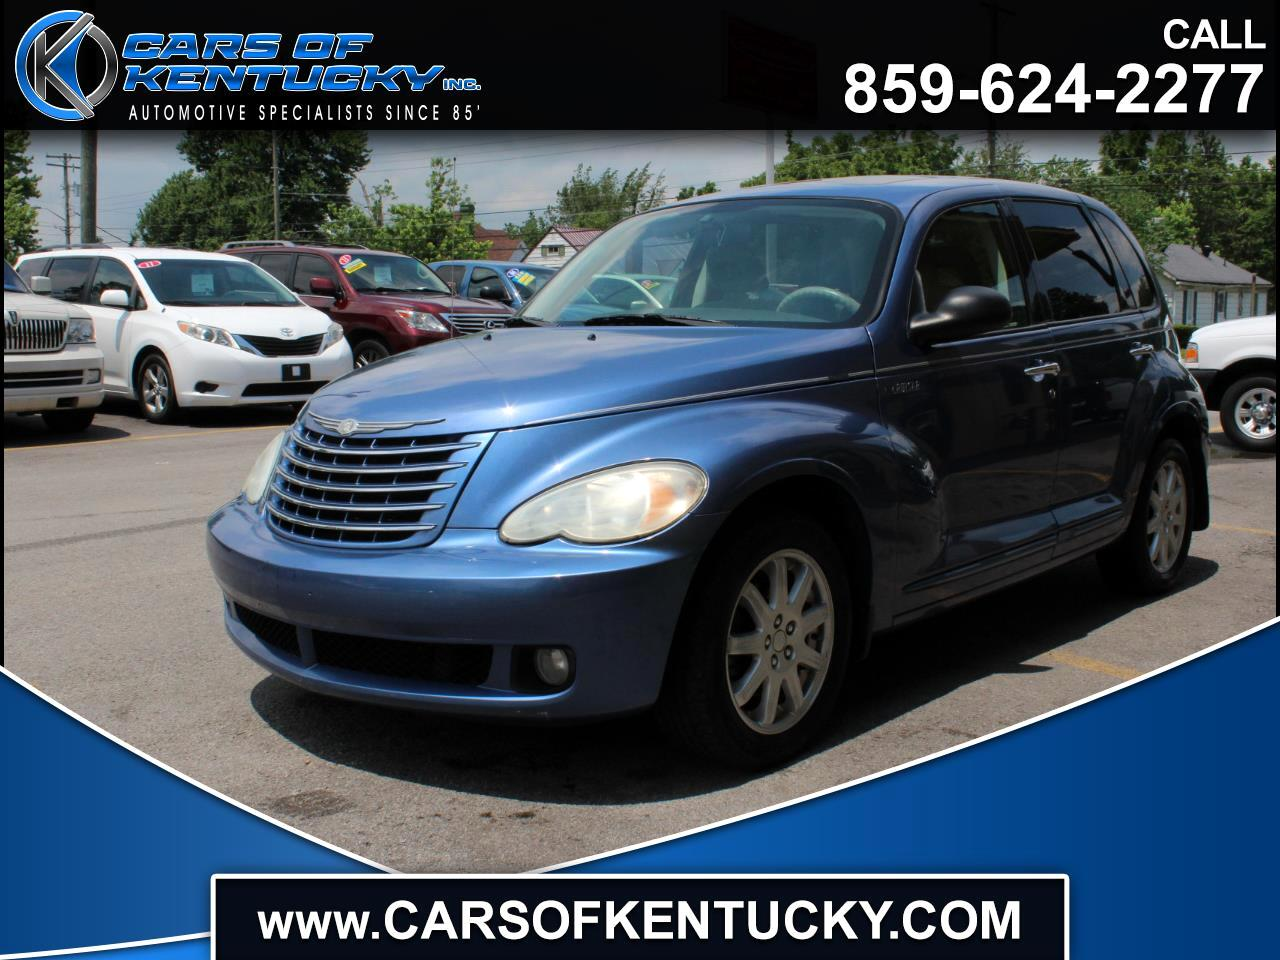 2006 Chrysler PT Cruiser Limited Edition